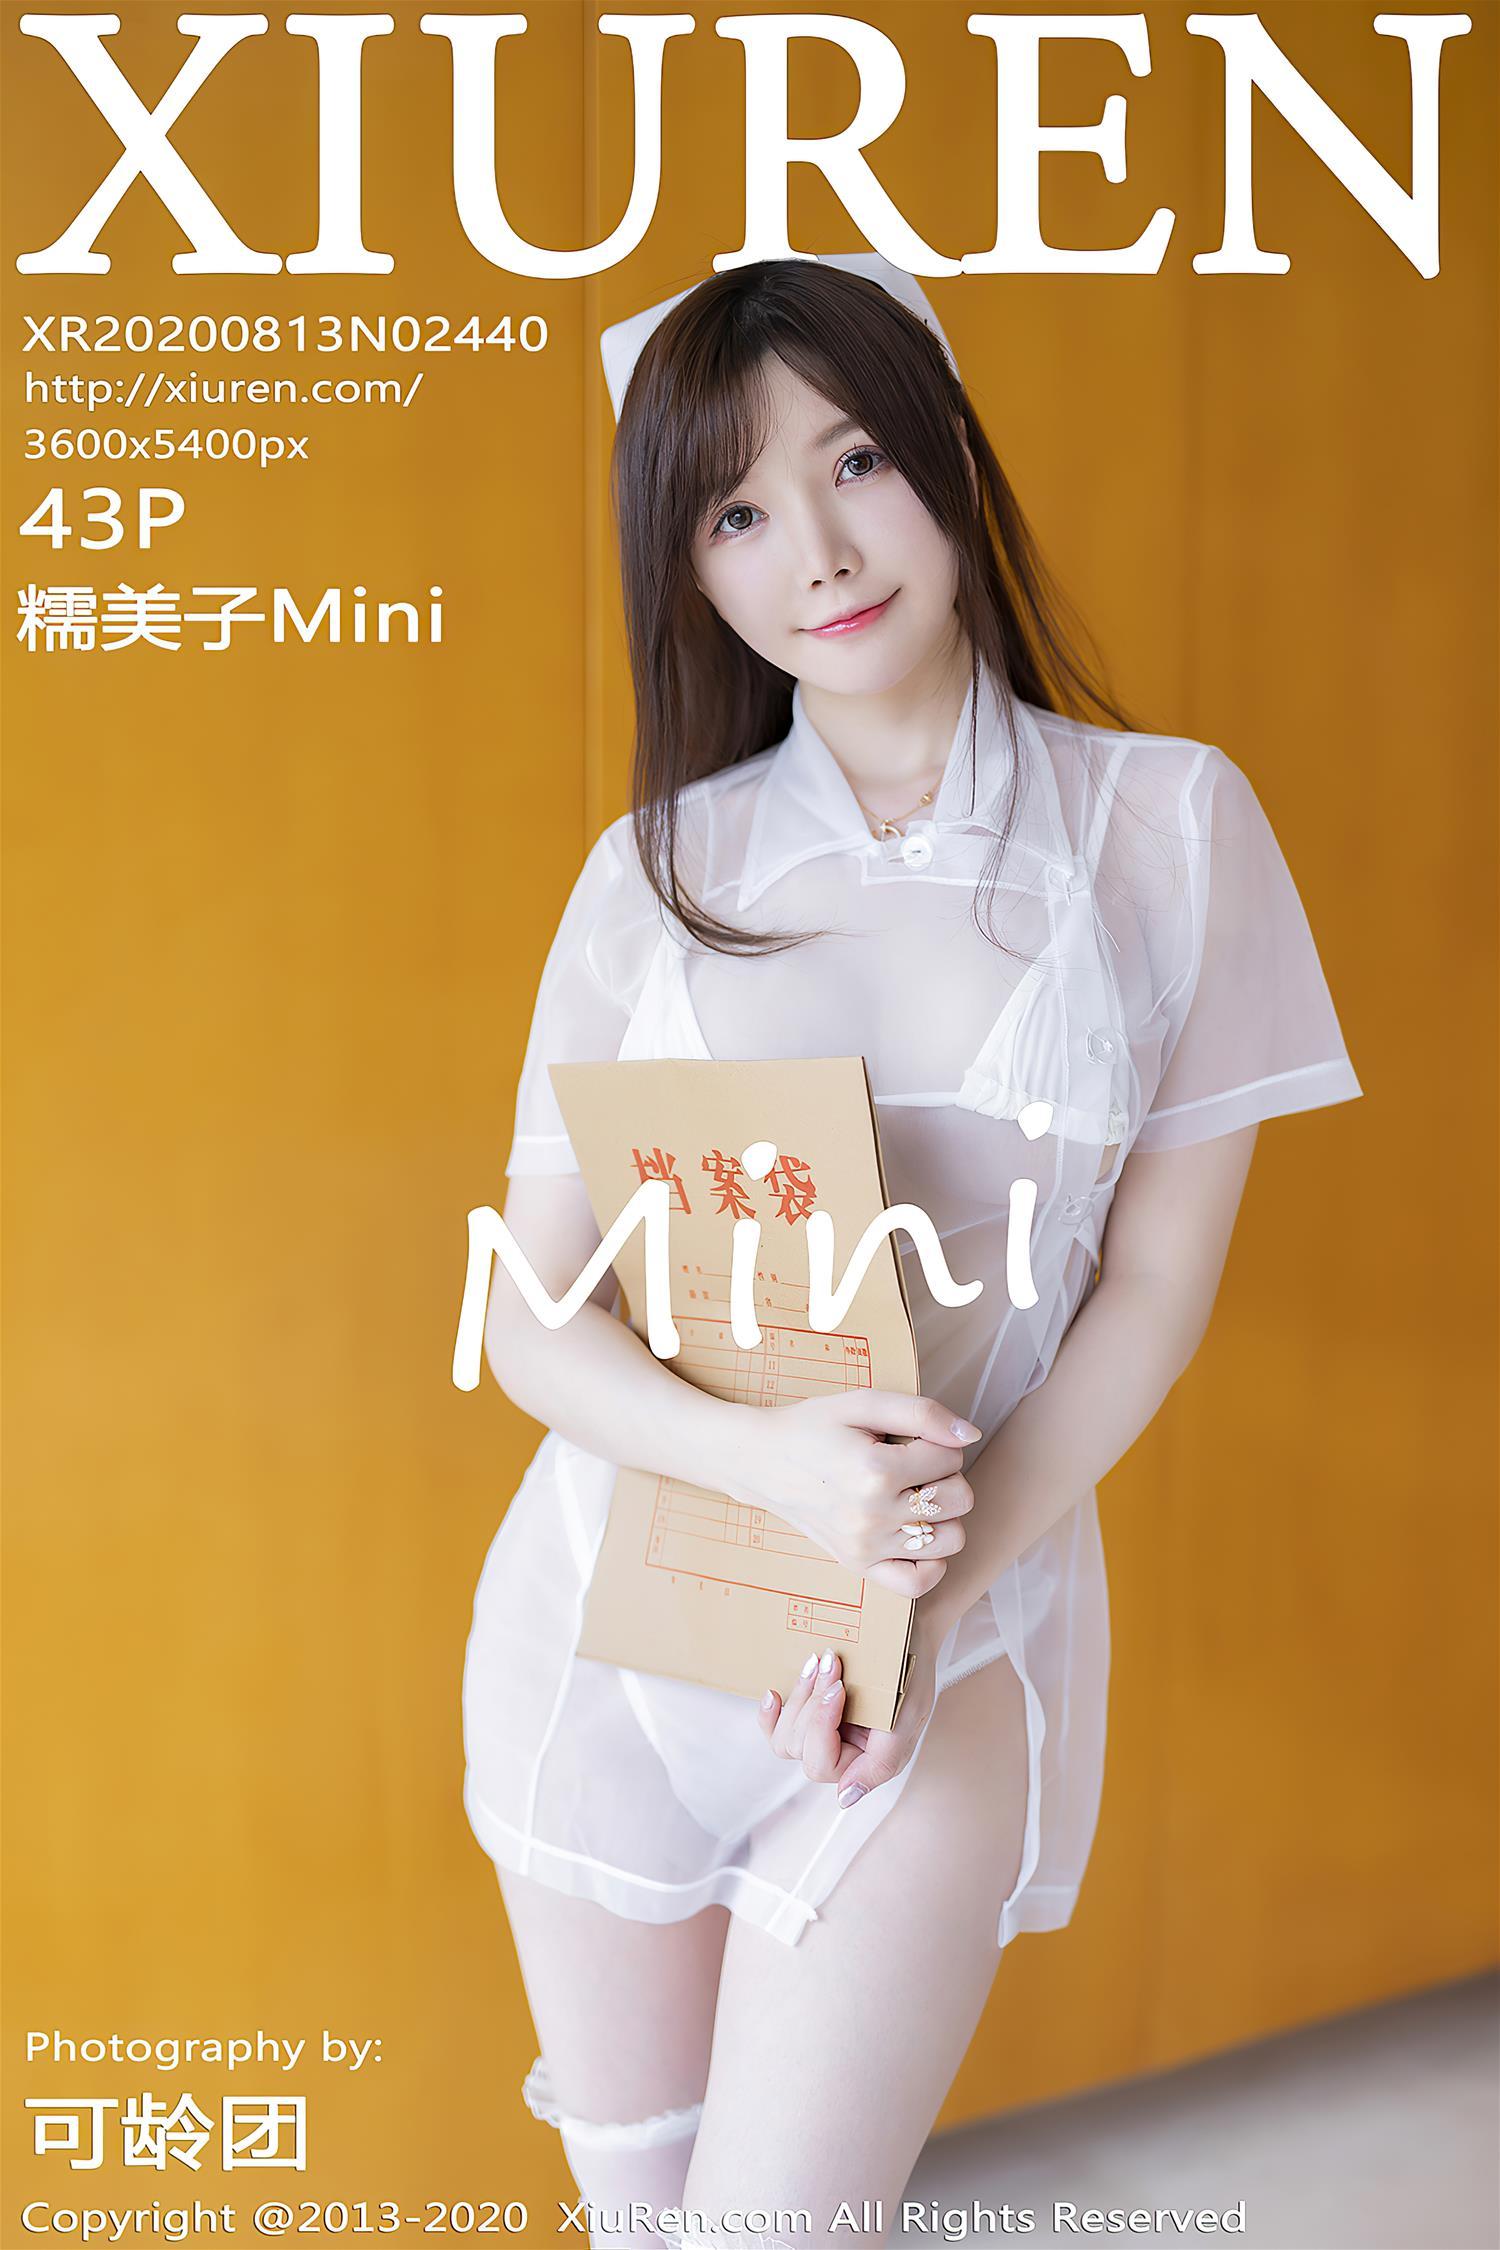 [XiuRen秀人网] 2020.08.13 NO.2440 糯美子Mini [44P]